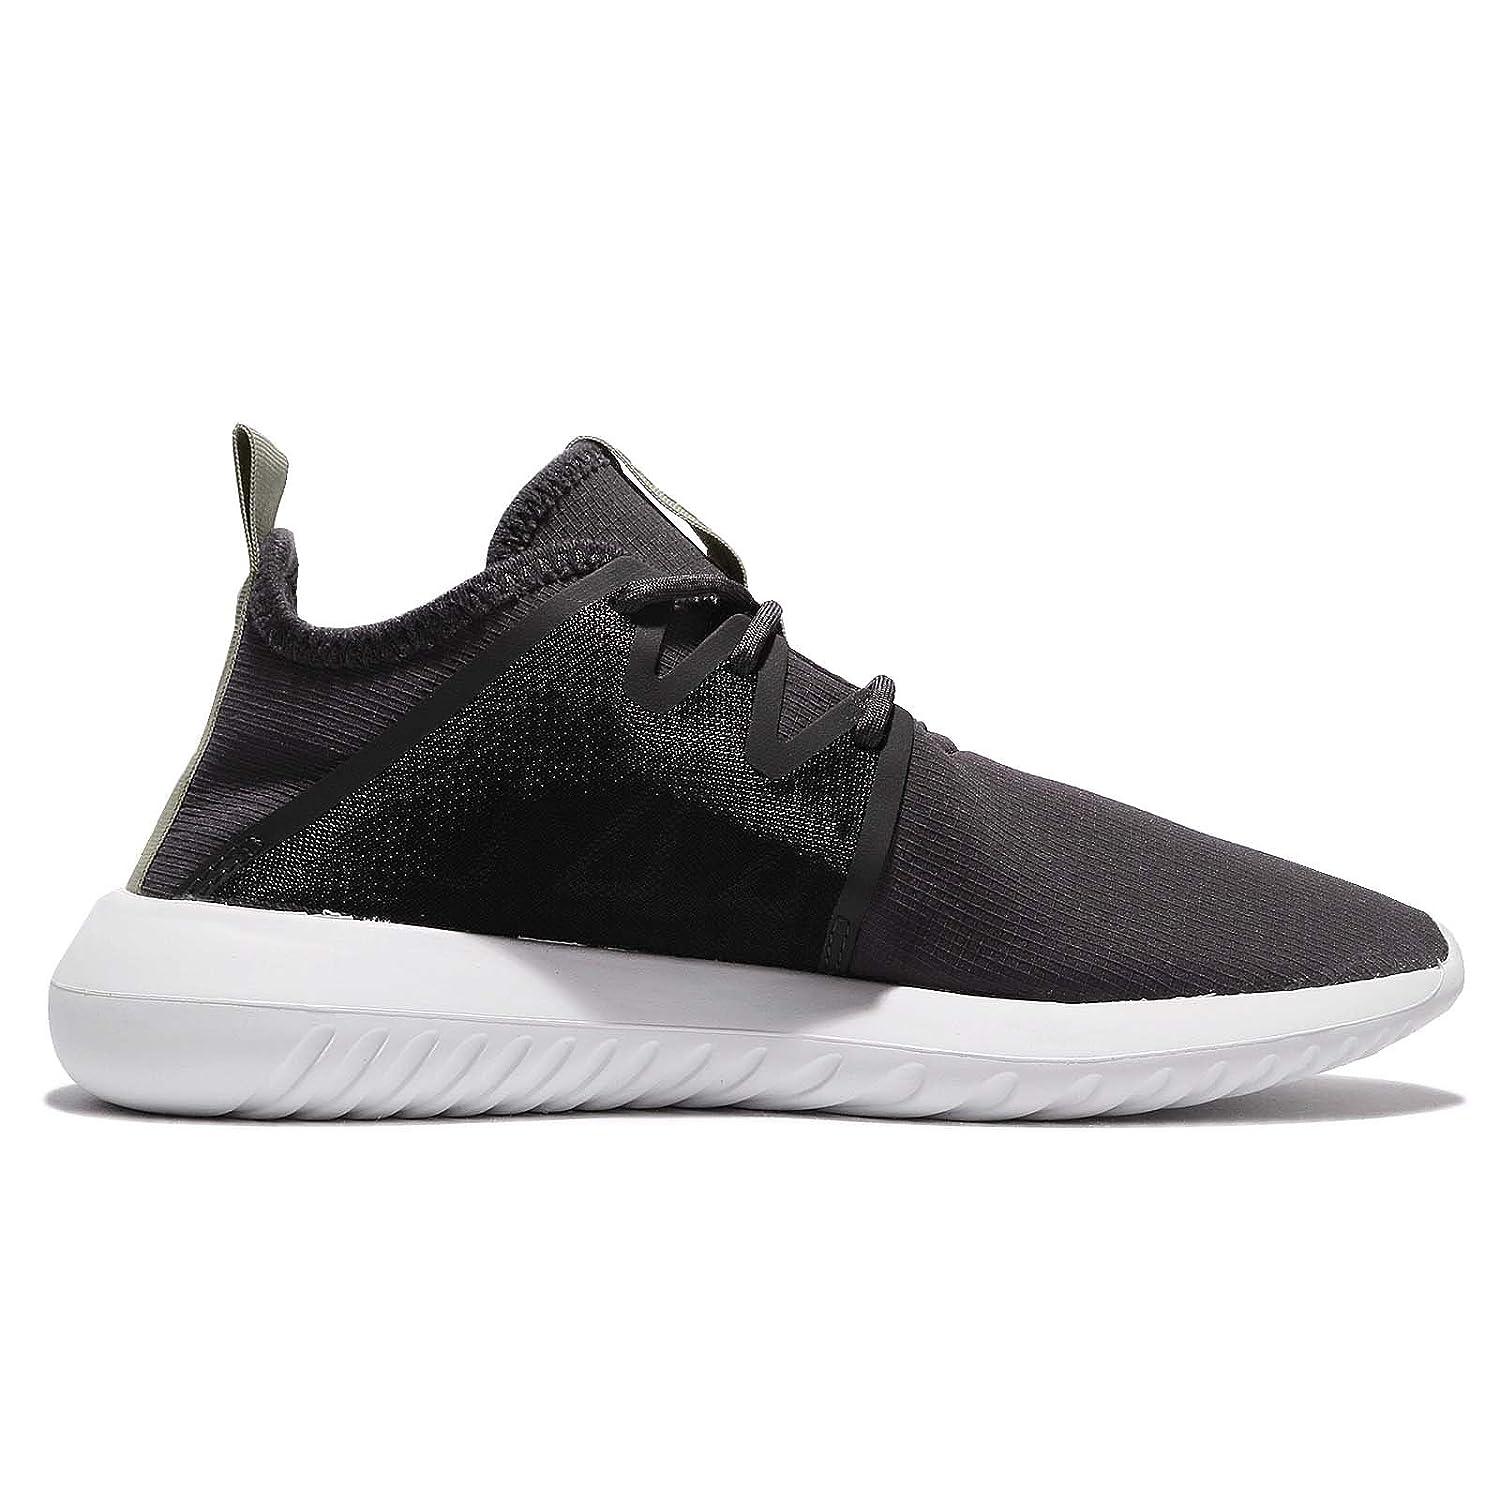 Adidas Donne Viral2 Tubulare 6 W, Nero / Bianco, 6 Tubulare Di Noi 11625d